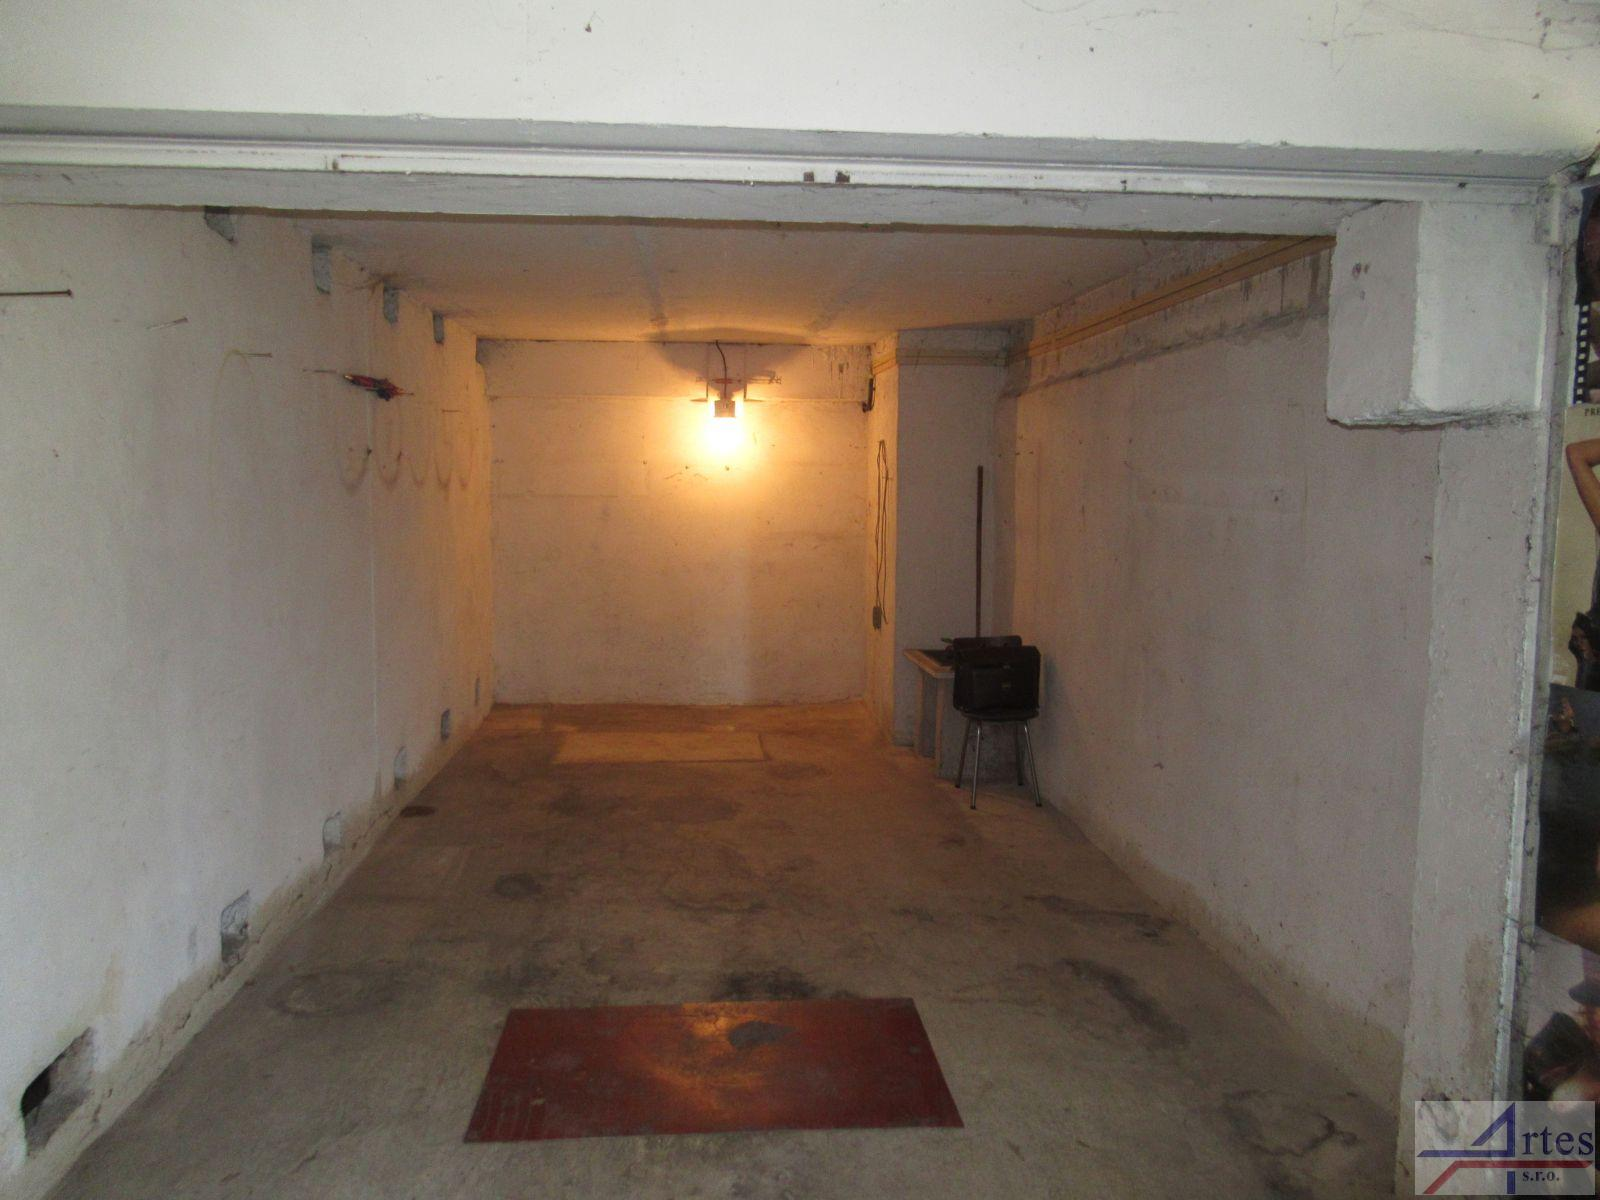 Pronájem samostatné garáže, 18 m2, ul. Písečná, Praha 8